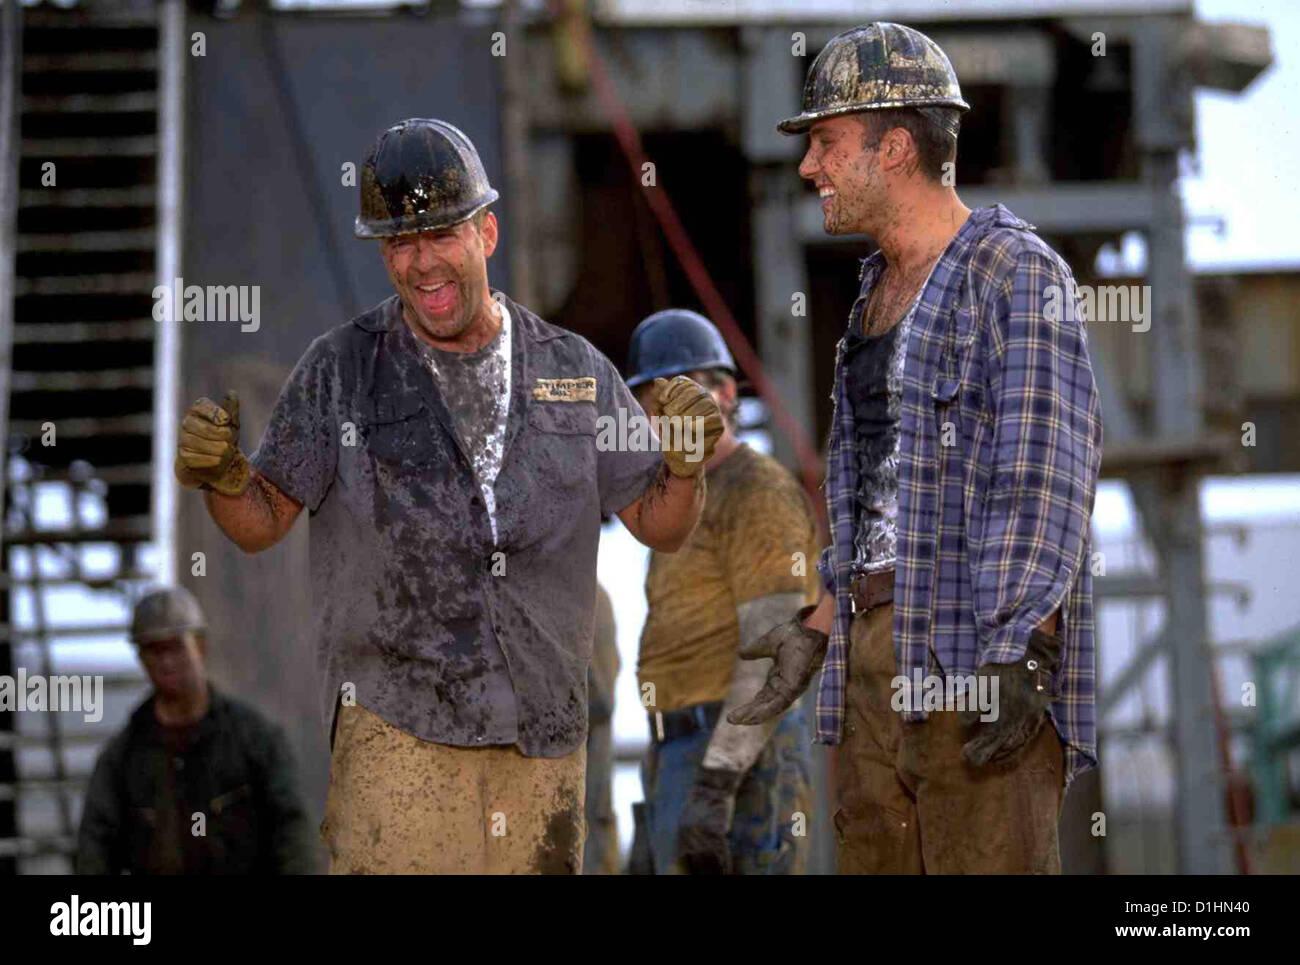 Armageddon - Das Juengste Gericht Armageddon Bruce Willis, Ben Stock